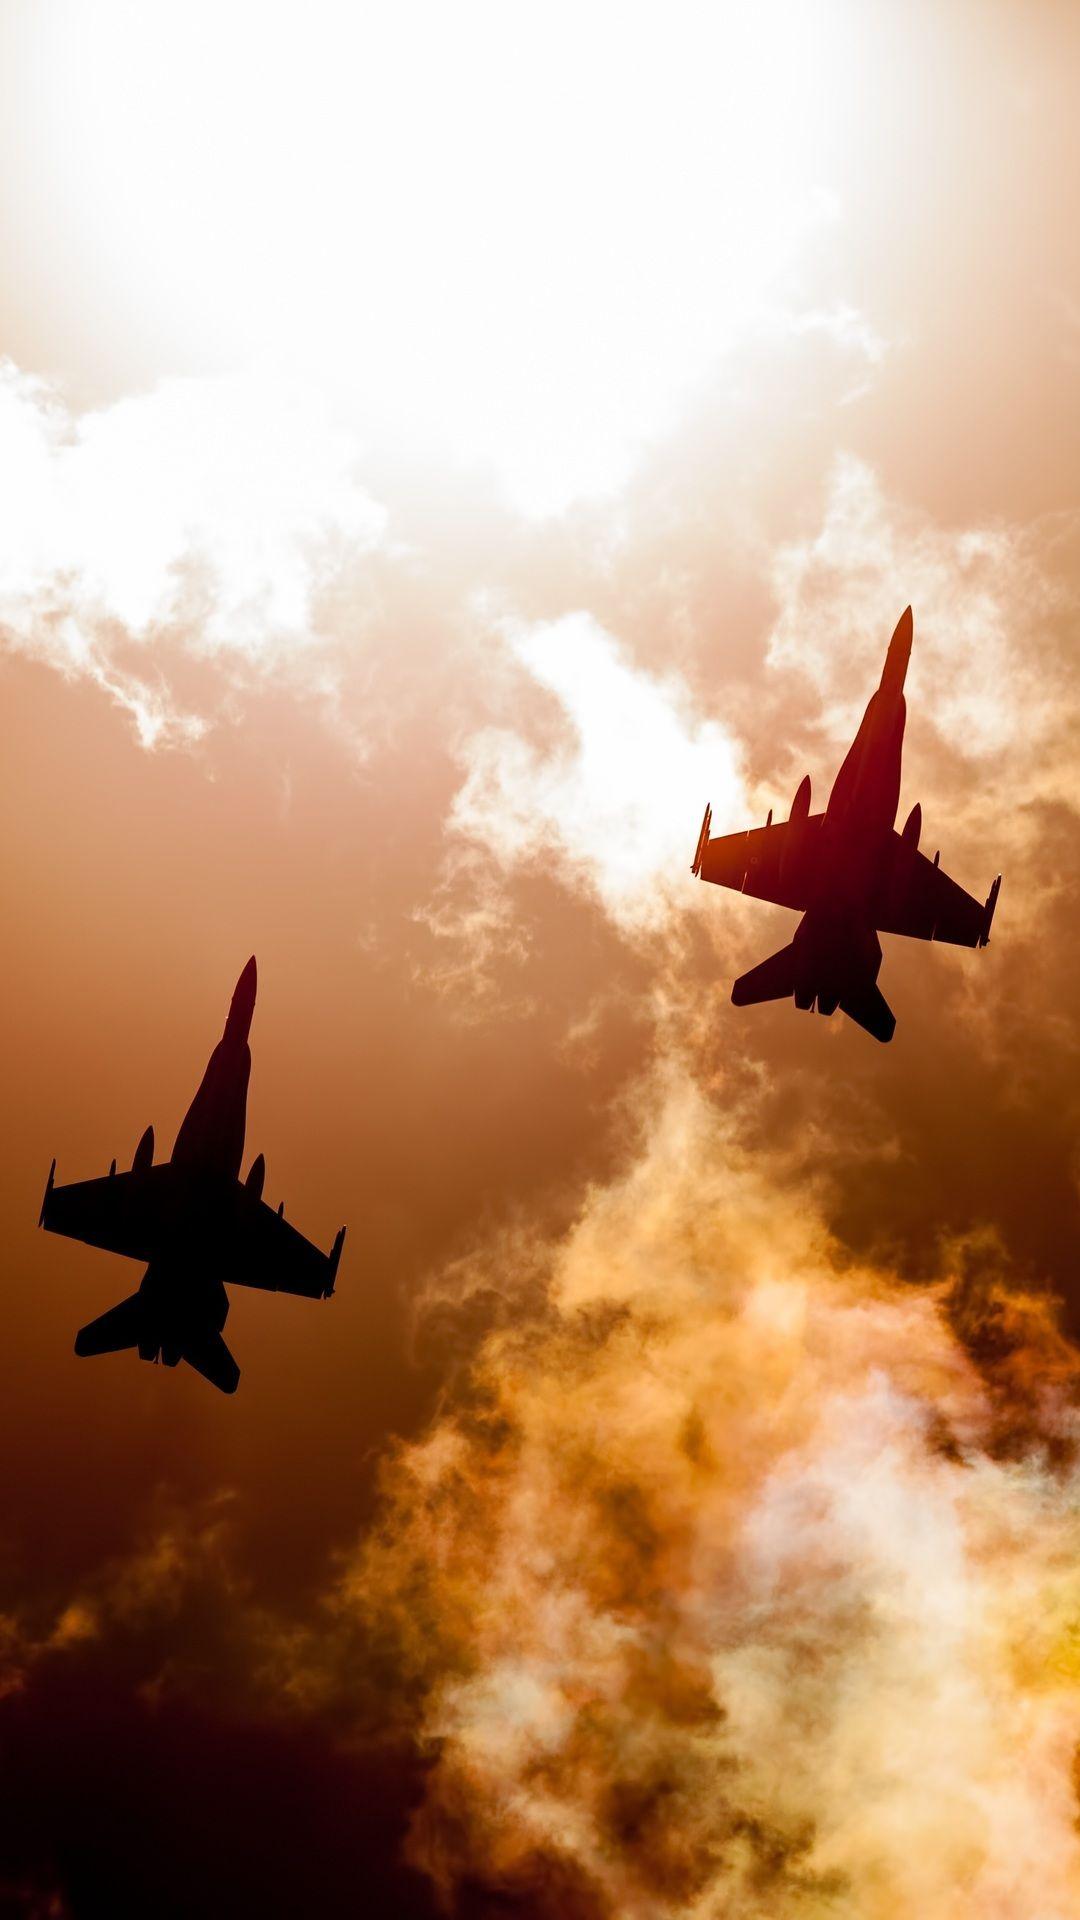 Jet Fighters Jet Fighter Pilot Fighter Jets Air Force Wallpaper